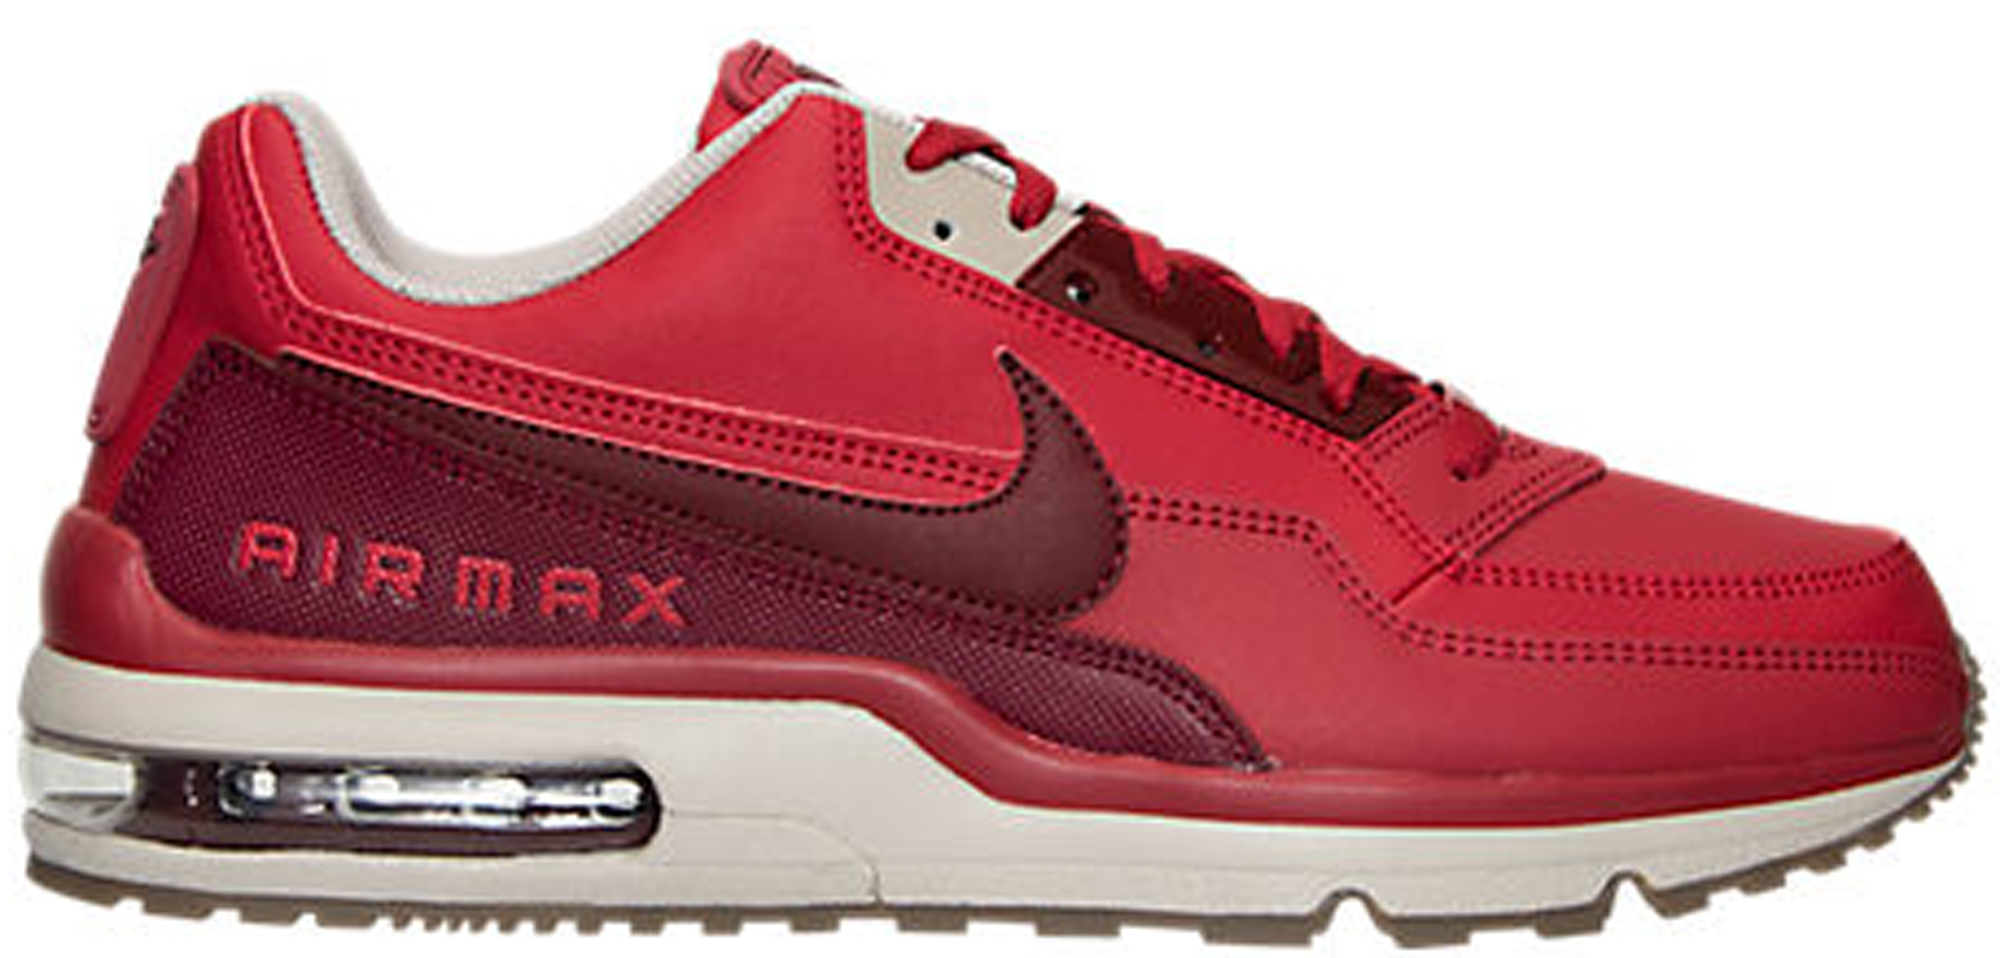 Nike Air Max LTD 3 Gym Red Team Red